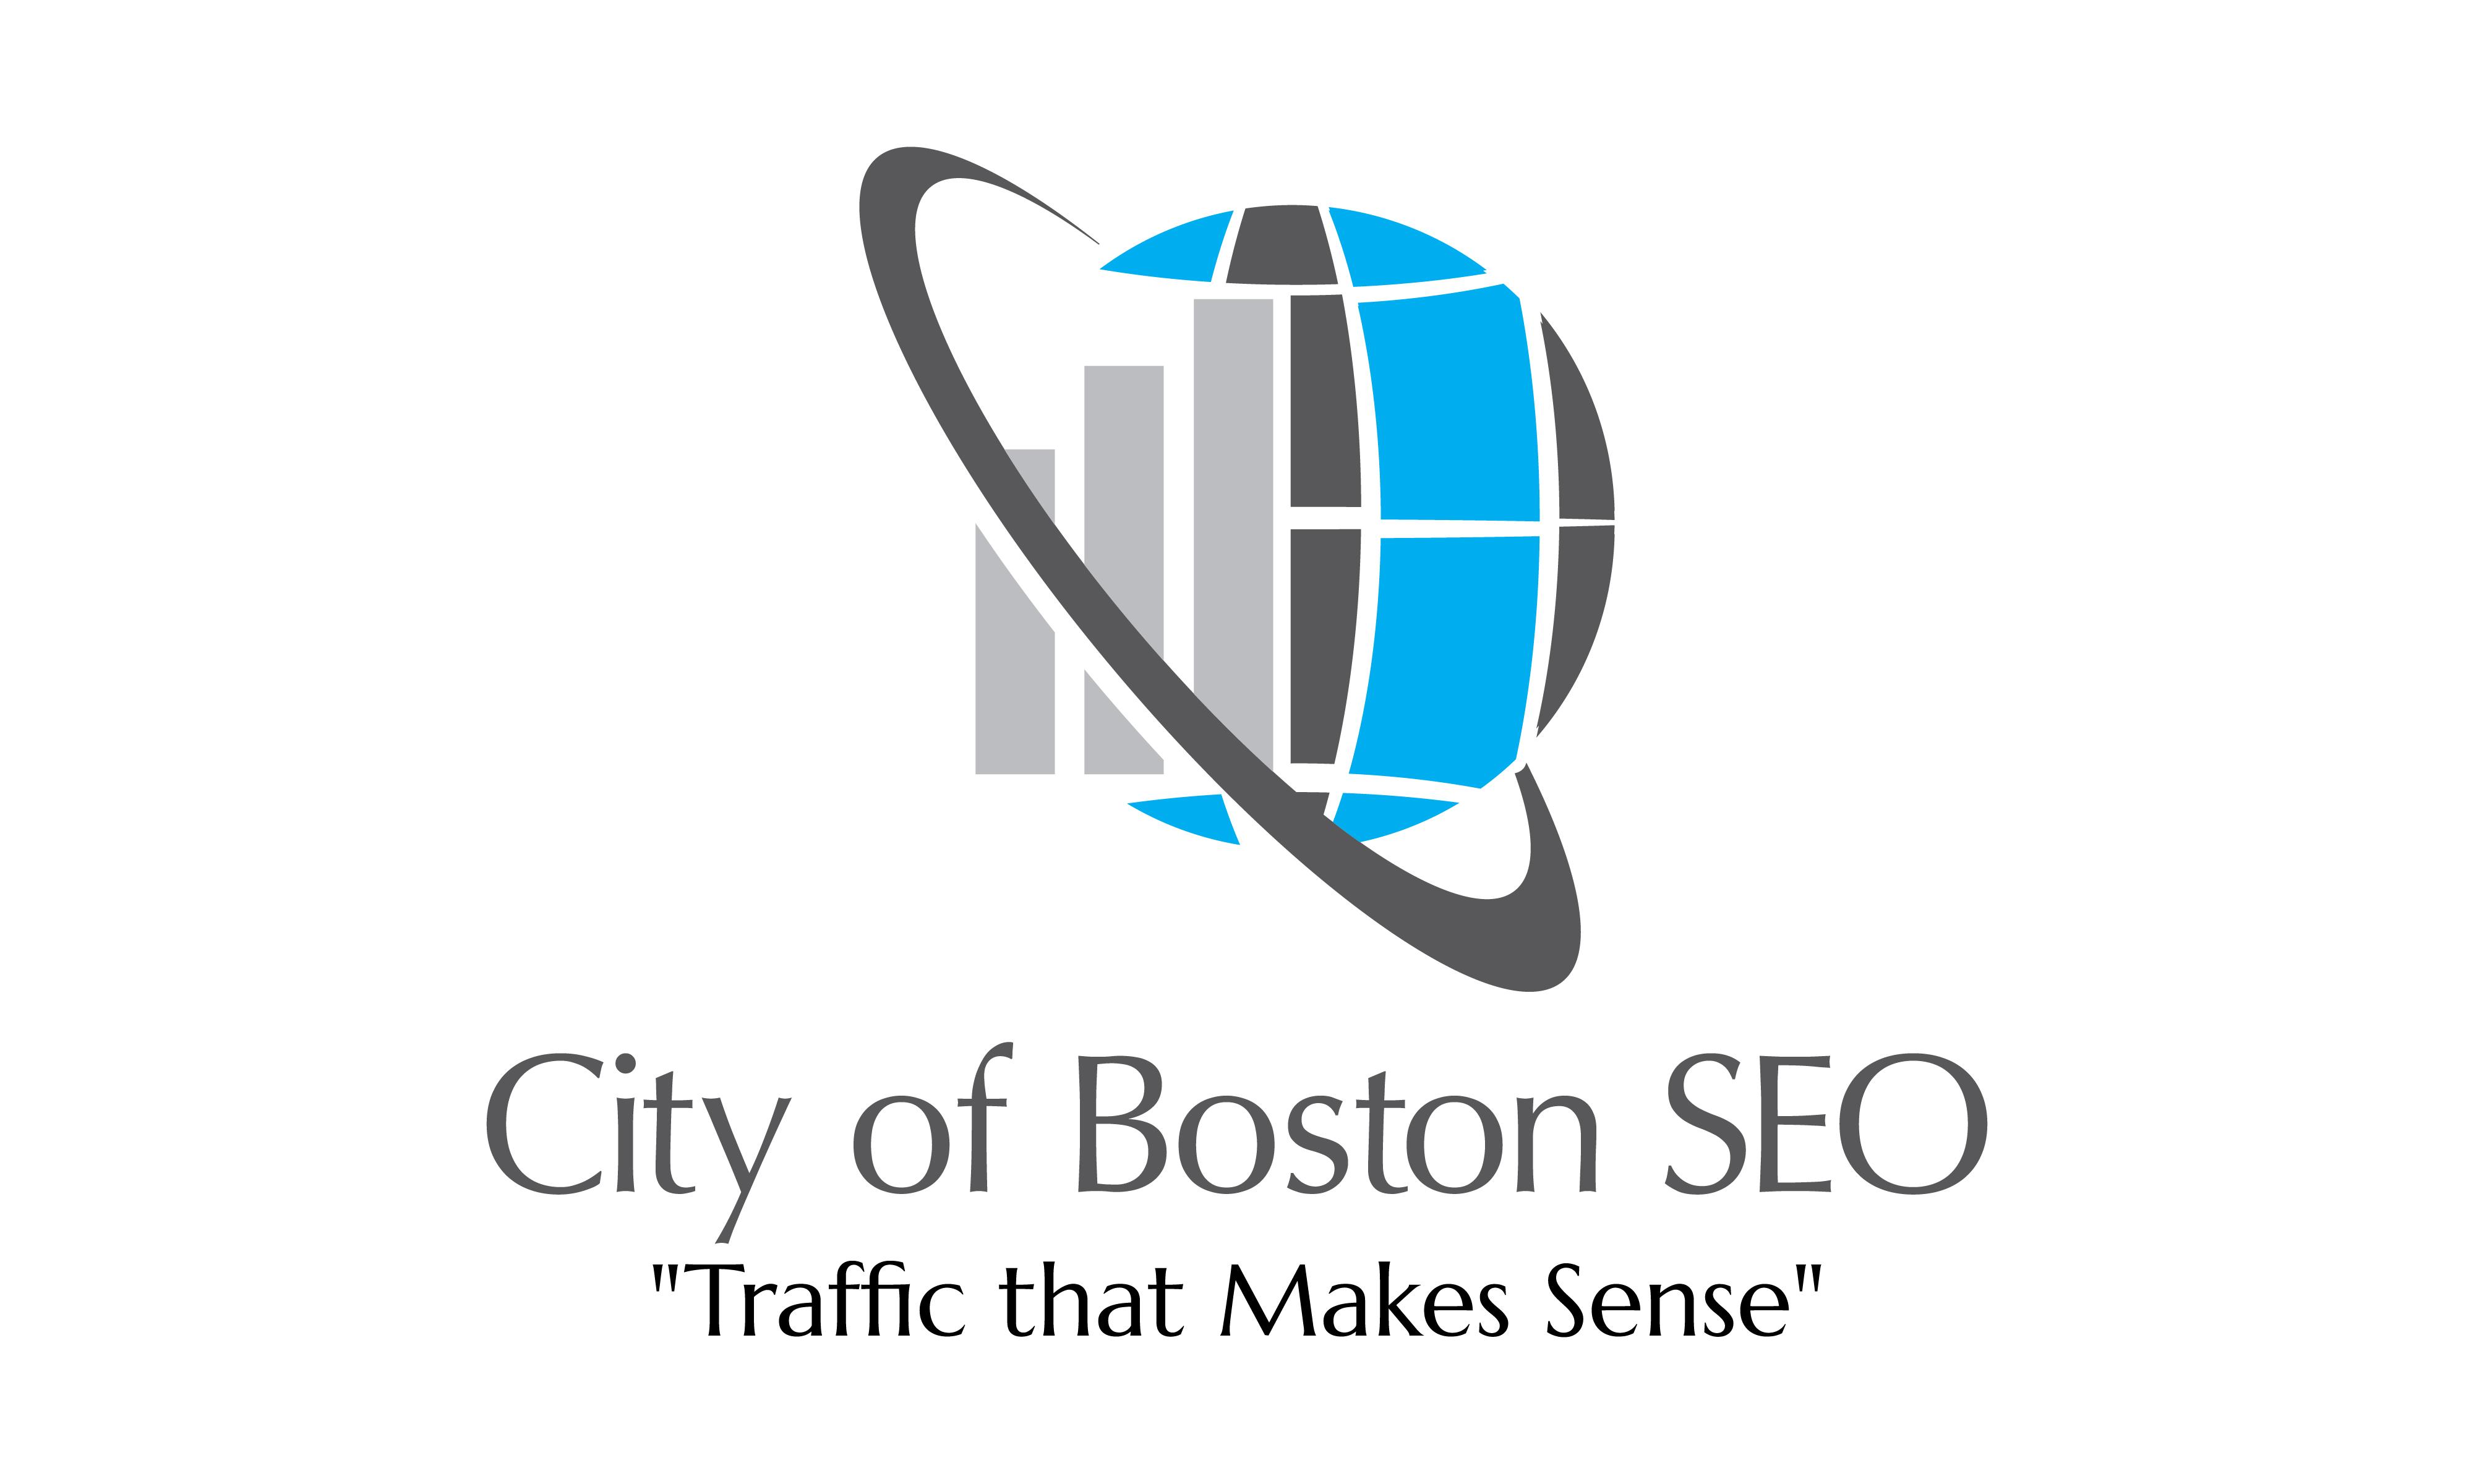 City of Boston SEO